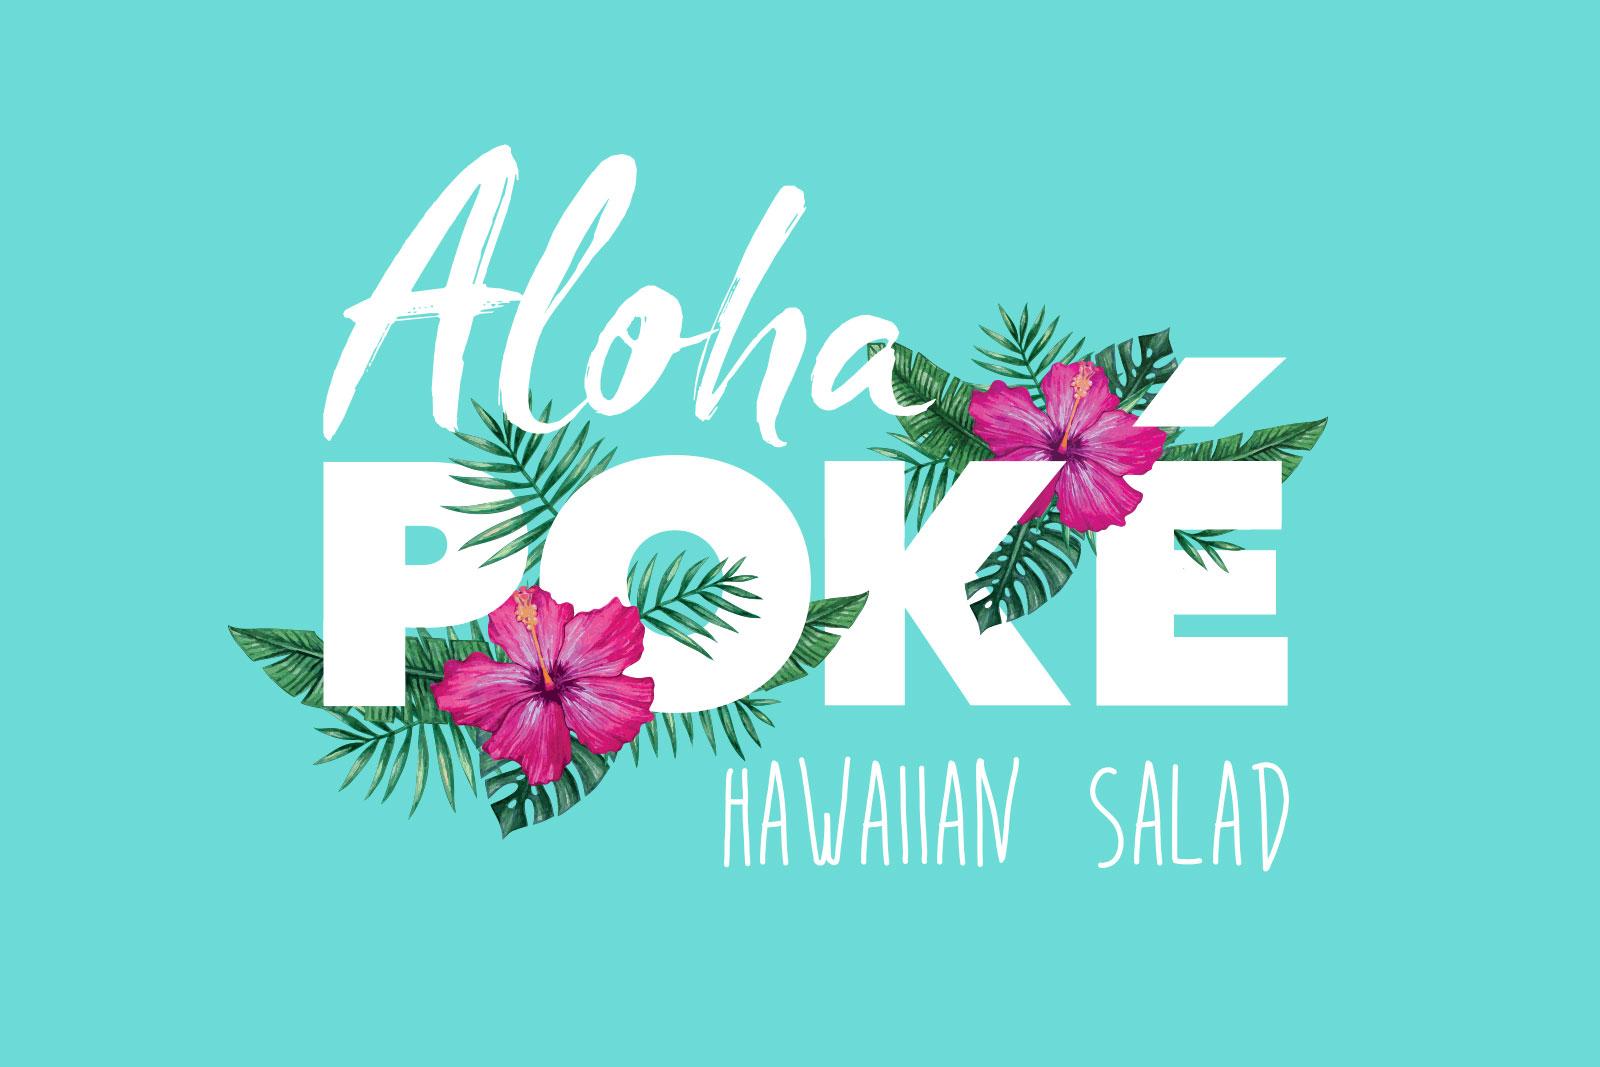 Aloha Poké Branding